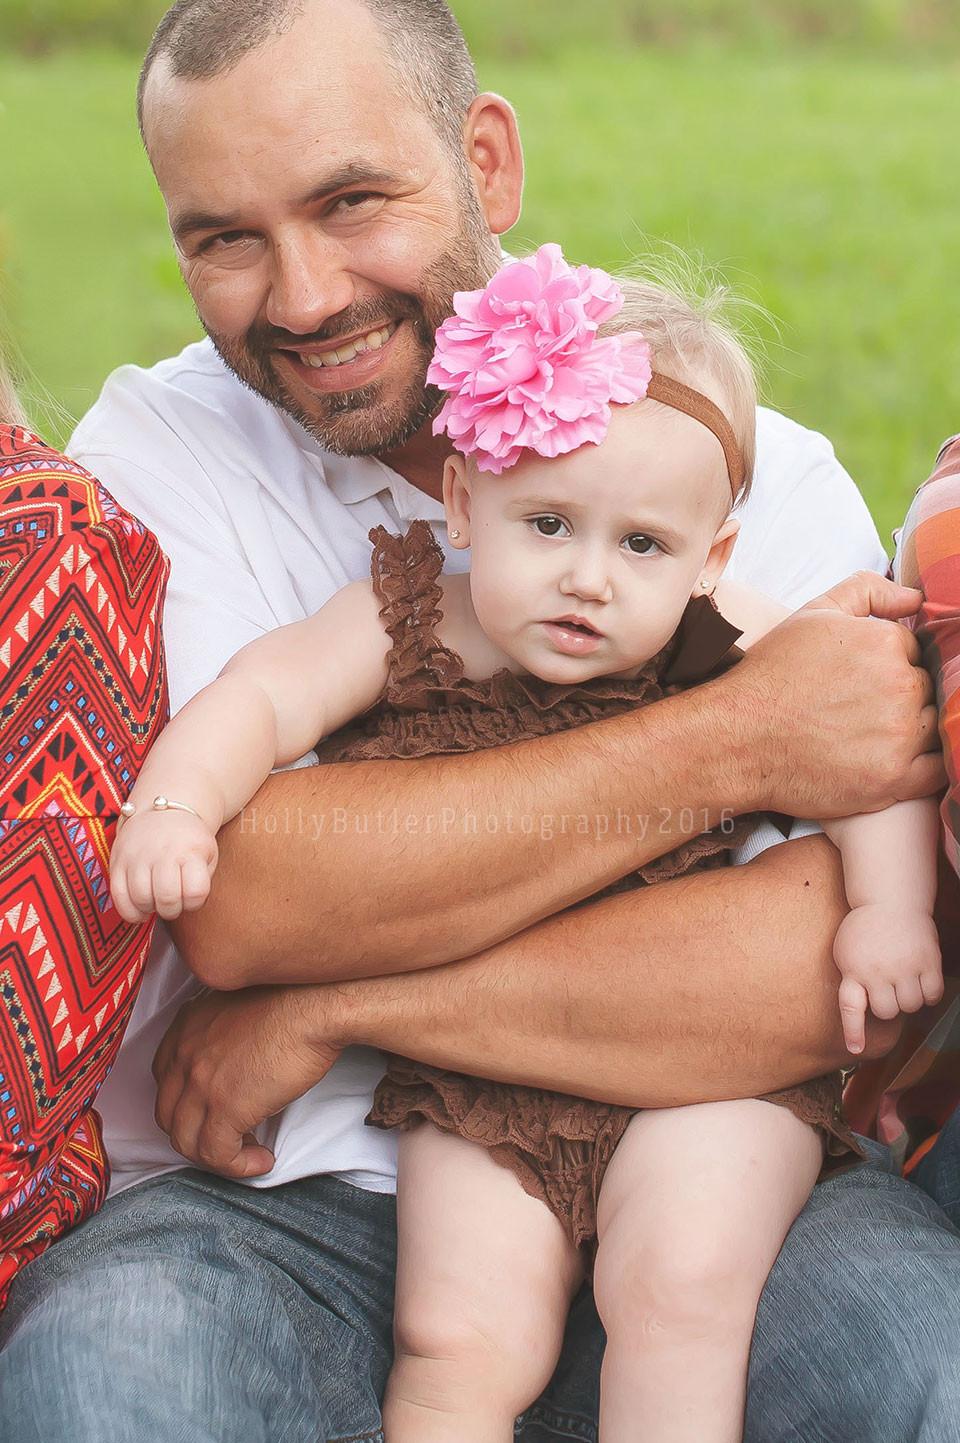 Holly Butler Photography | Family